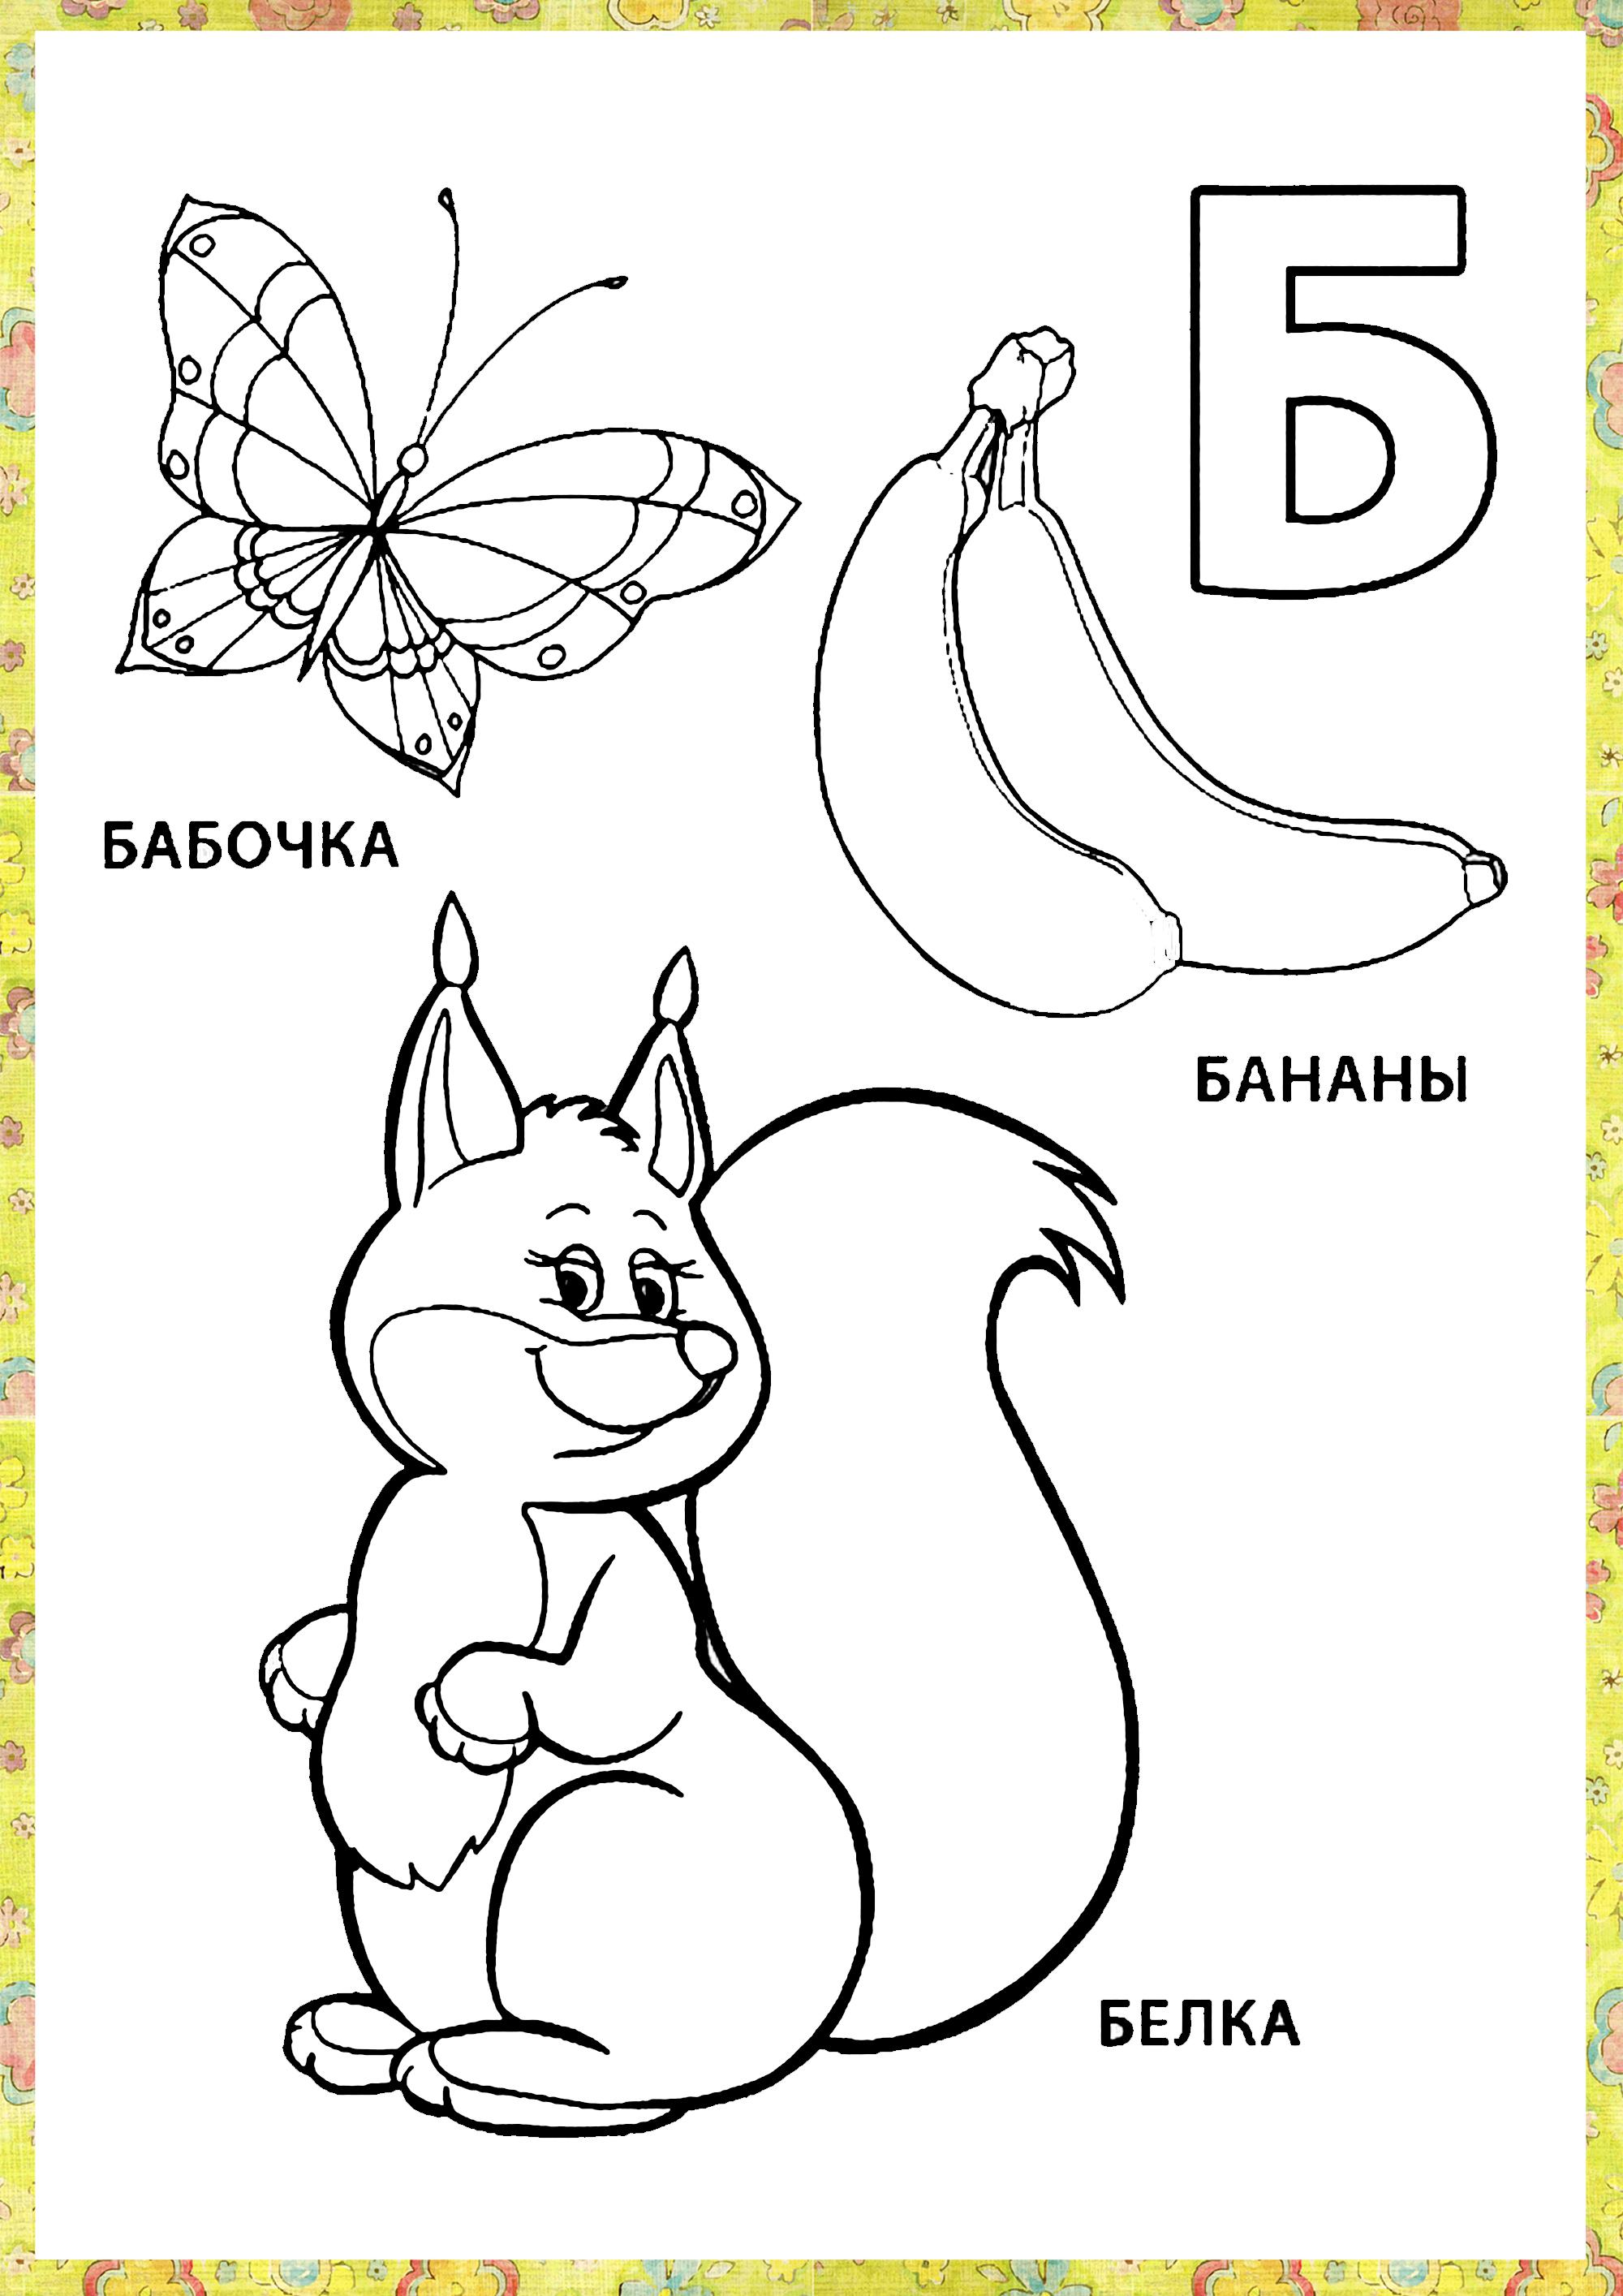 Буква б, бабочка, банан, белка